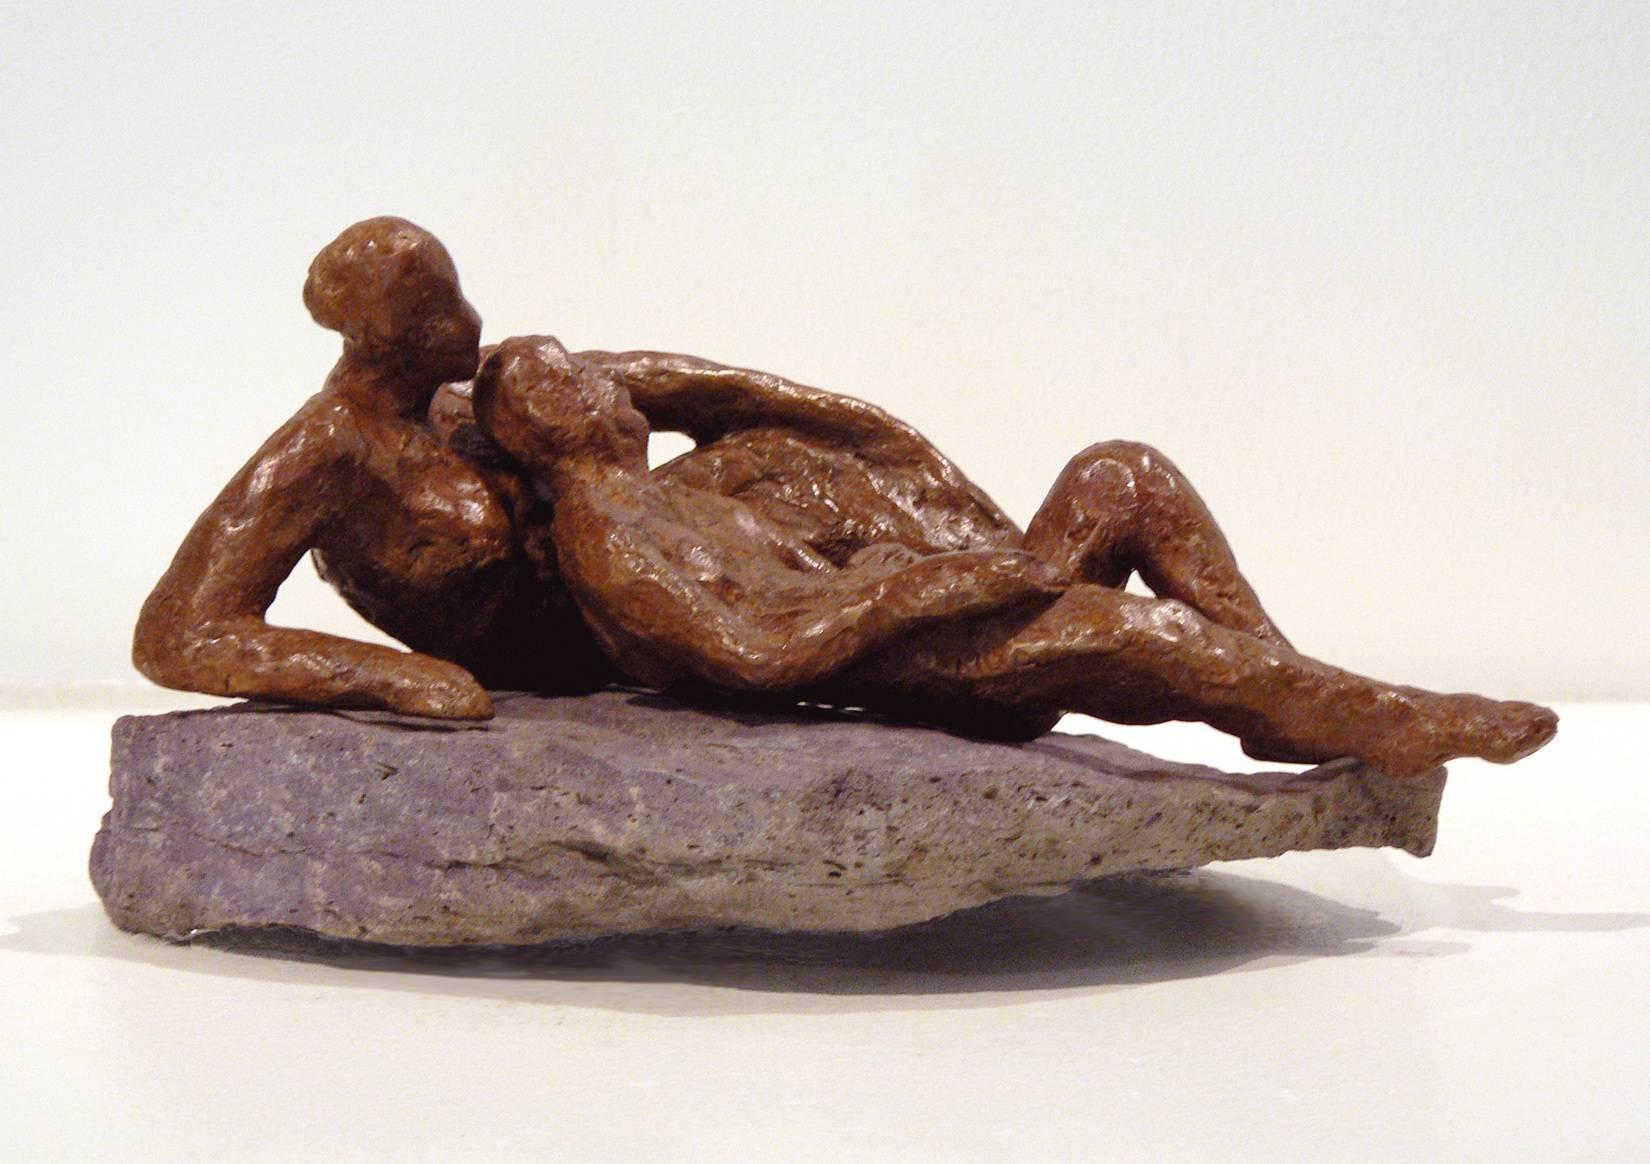 Repose -figurative bronze on stone sculpture by New York artist Noa Bornstein